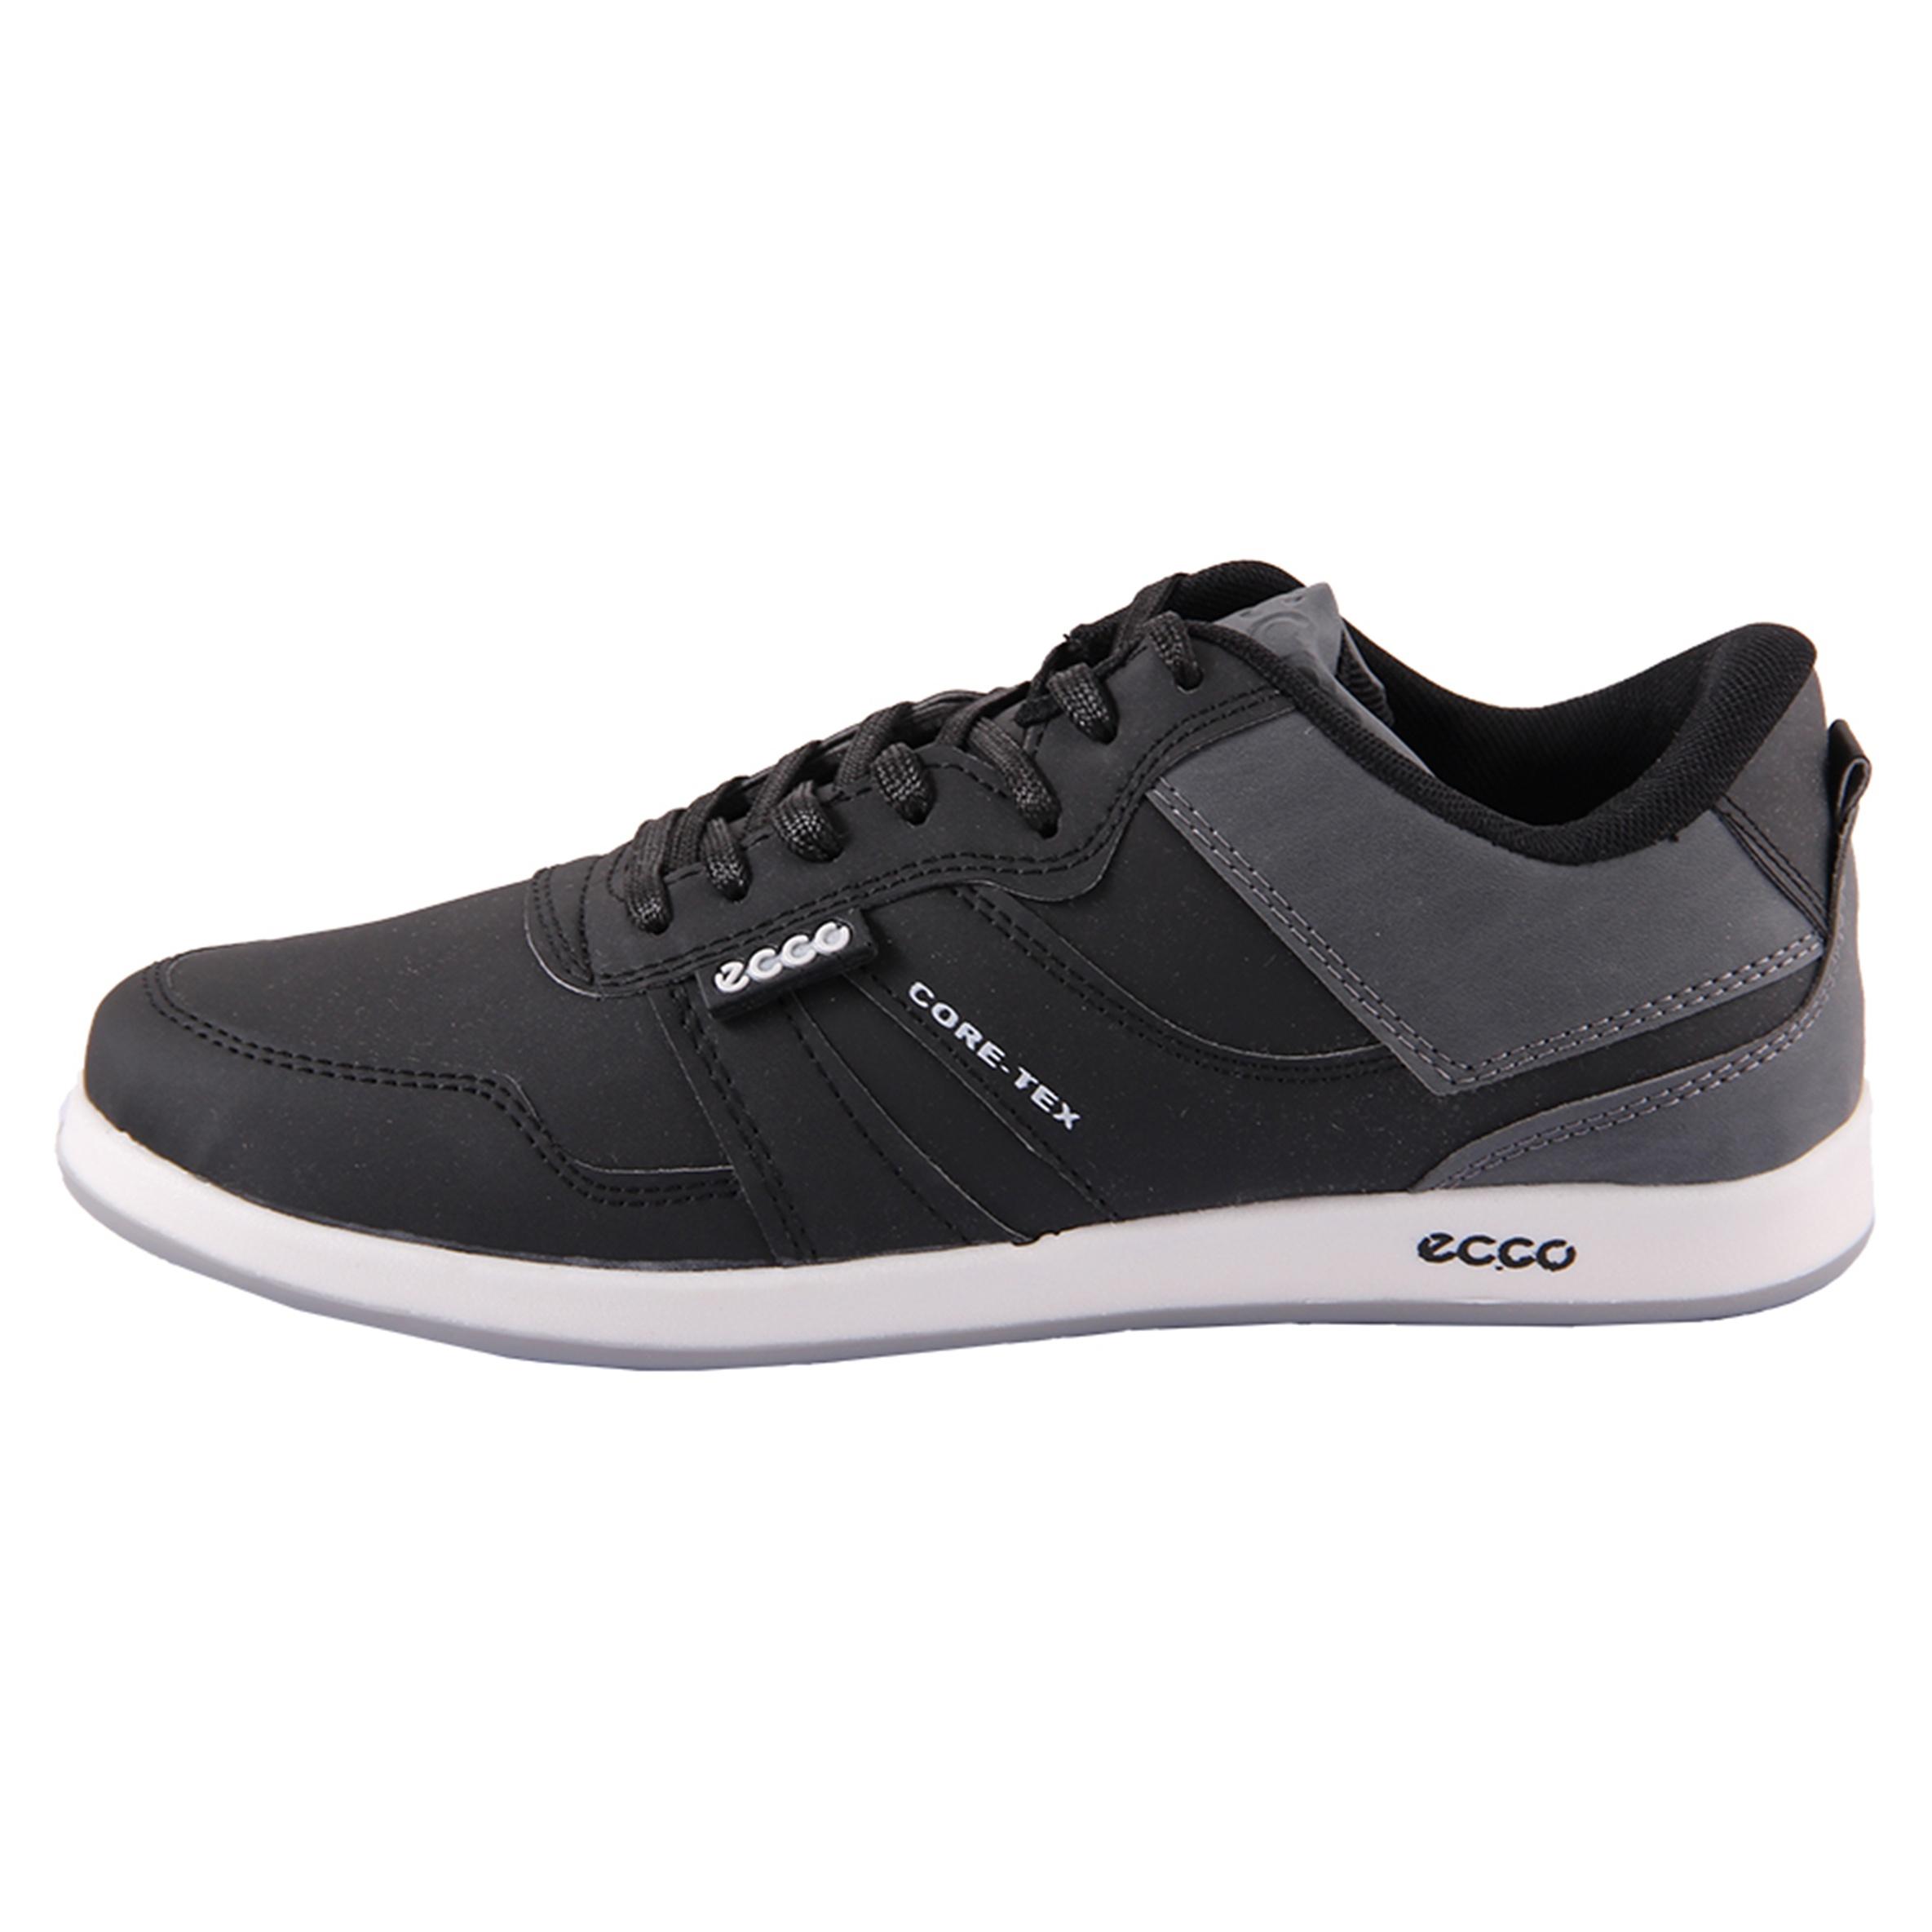 خرید                      کفش اسپورت مردانه کد 35-39793